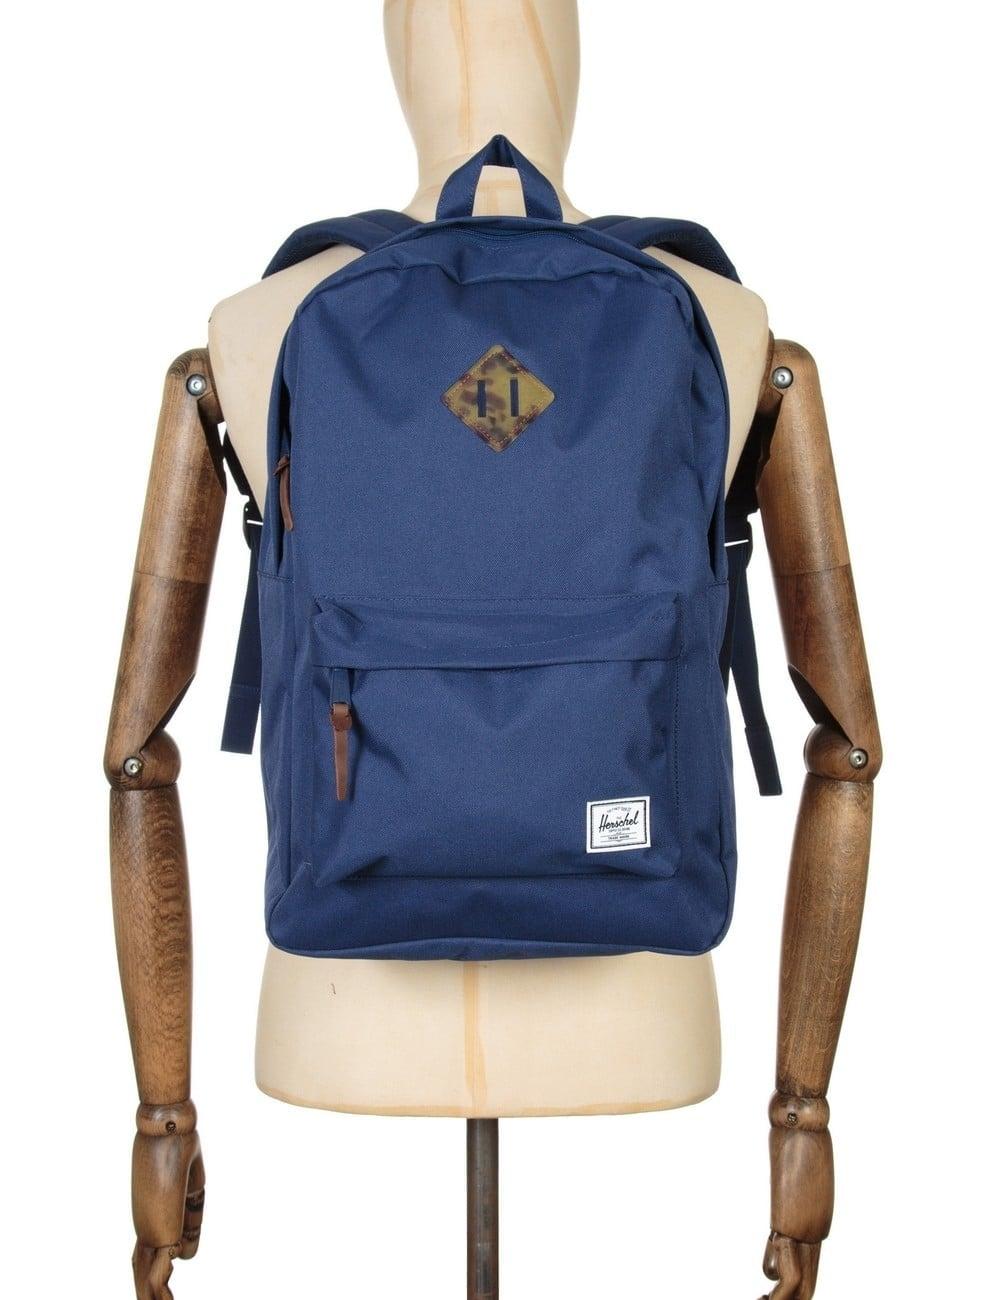 a1c80f26e83b Herschel Supply Co Heritage 21.5L Backpack - Twilight Blue Tortoise Shell